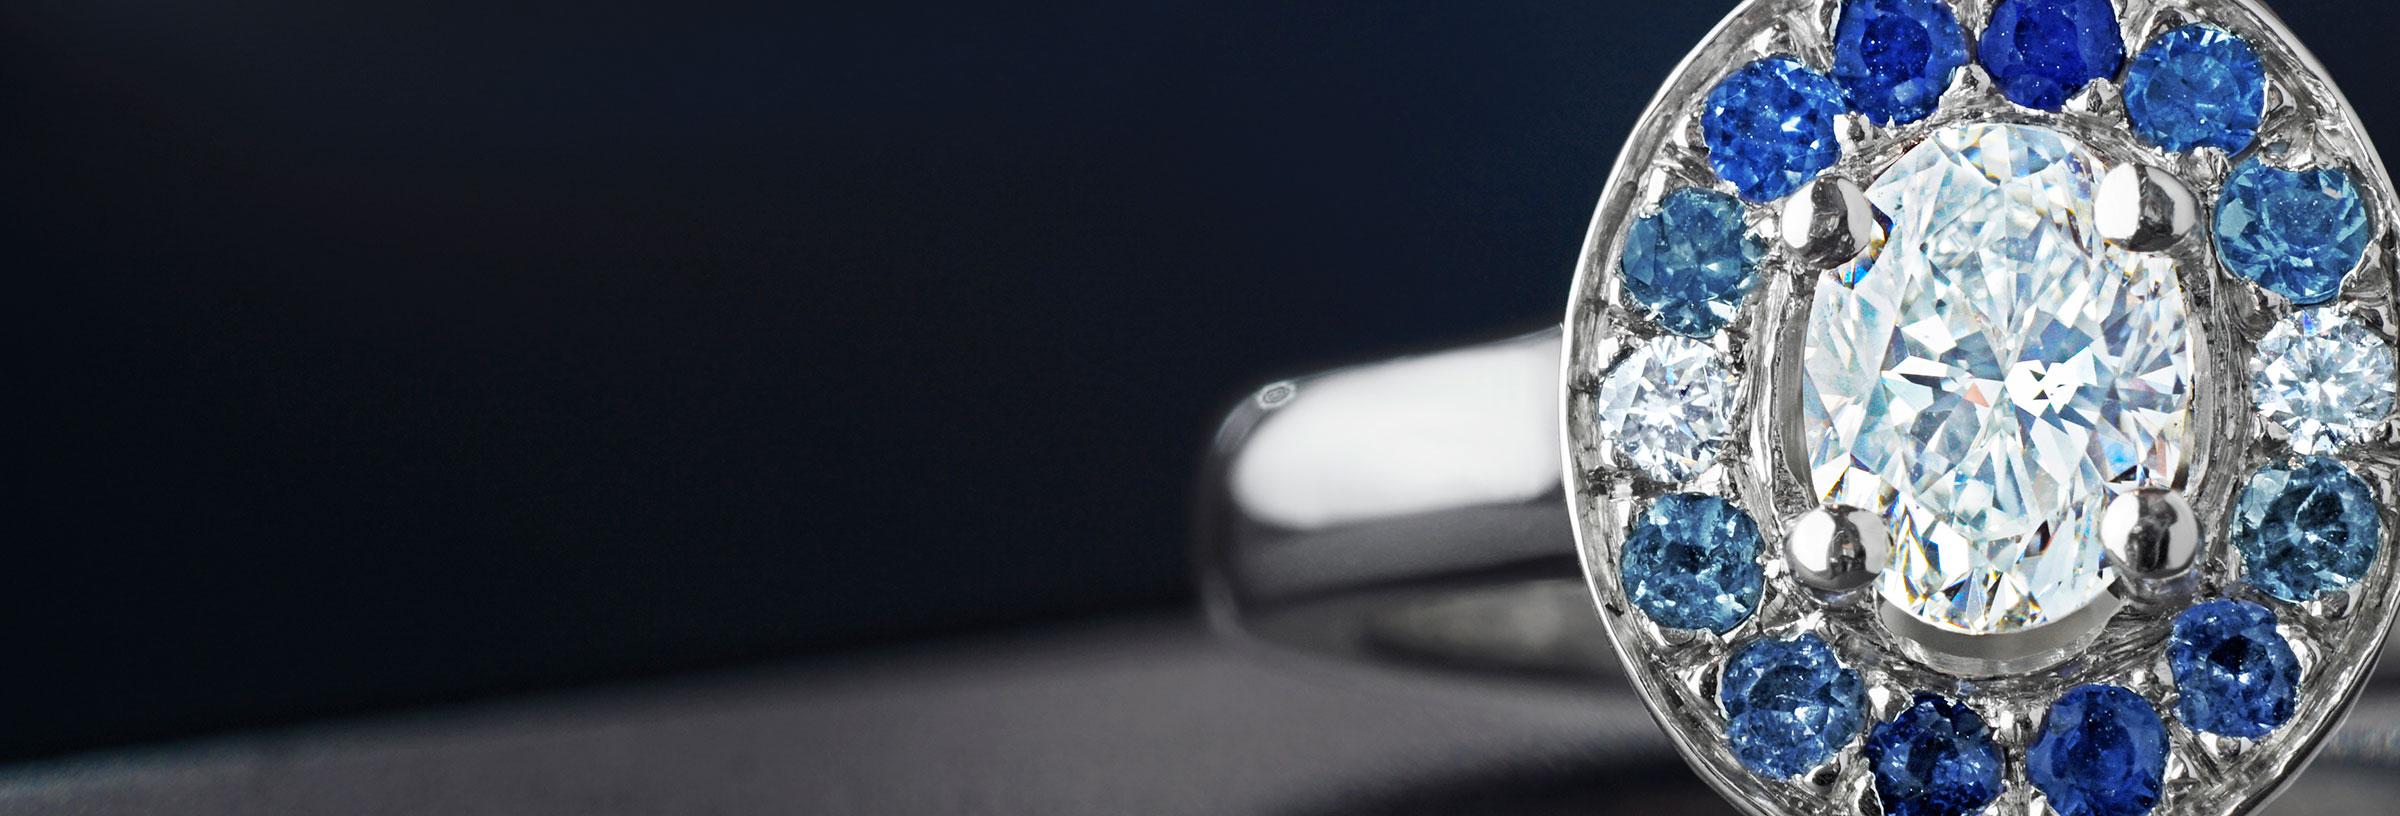 0.61ct oval diamond, graduated sapphire and aquamarine ring